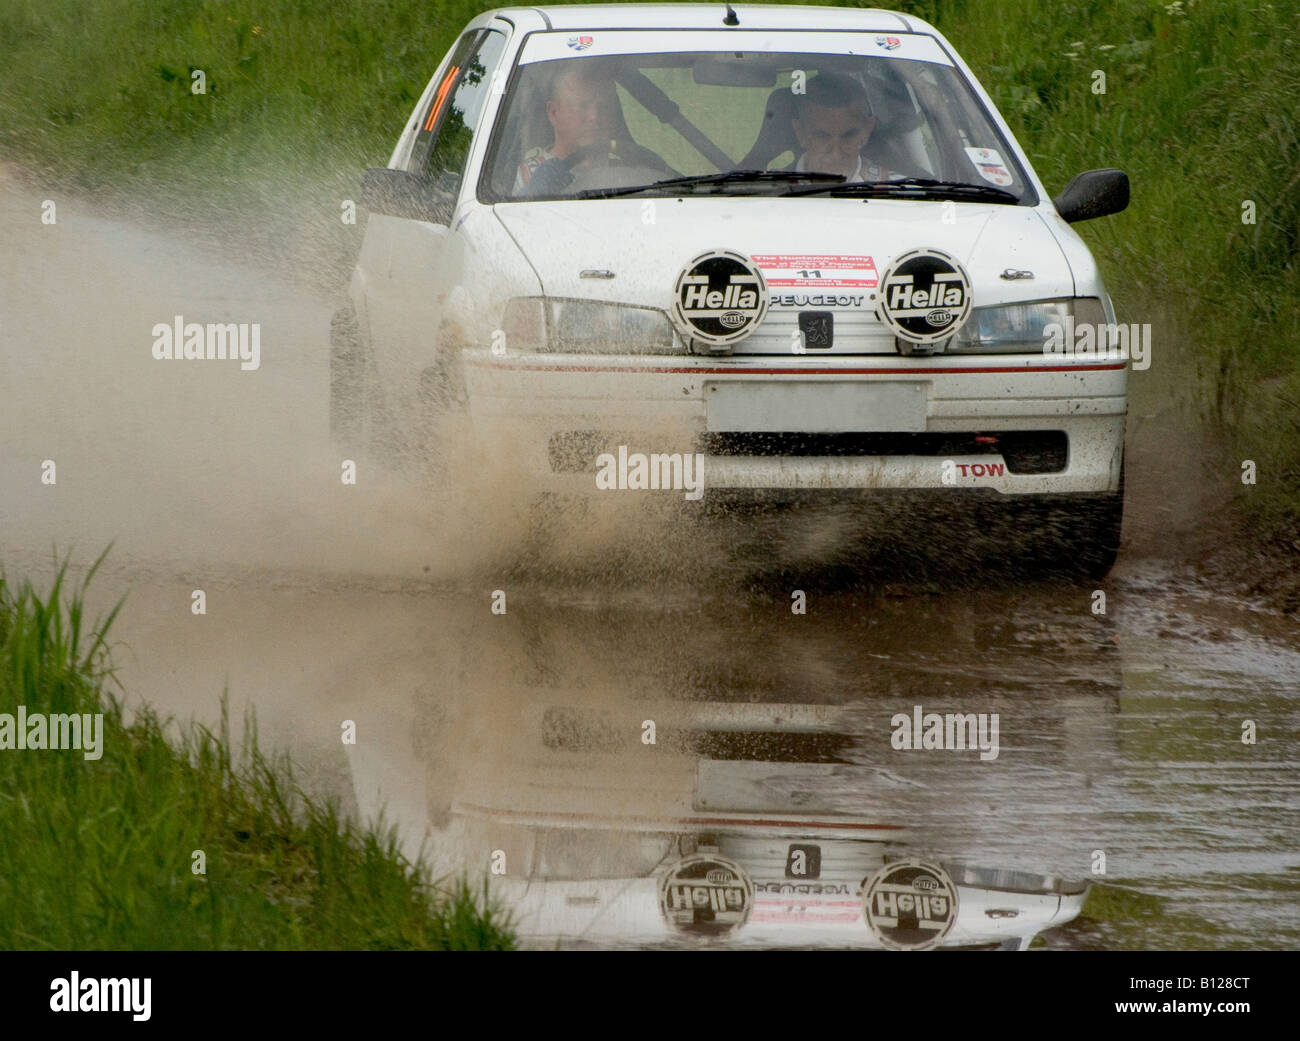 Rally car making a splash Stock Photo, Royalty Free Image ...